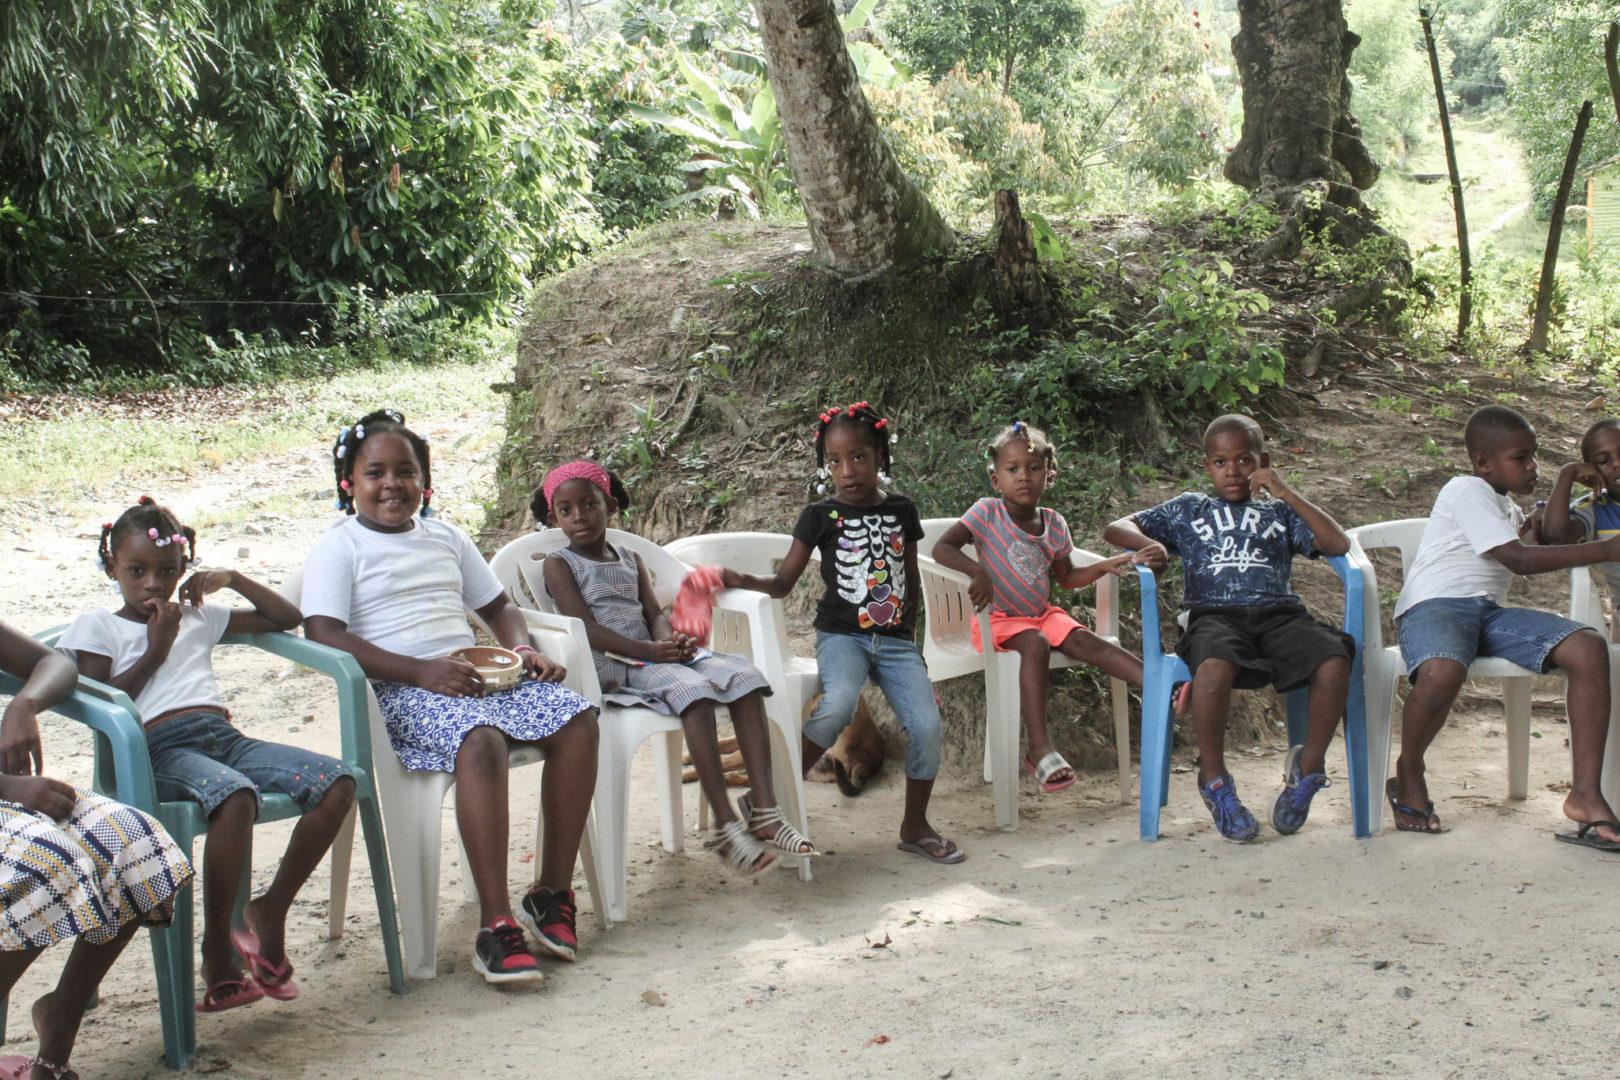 A group of kids gather in the community of La Joya.